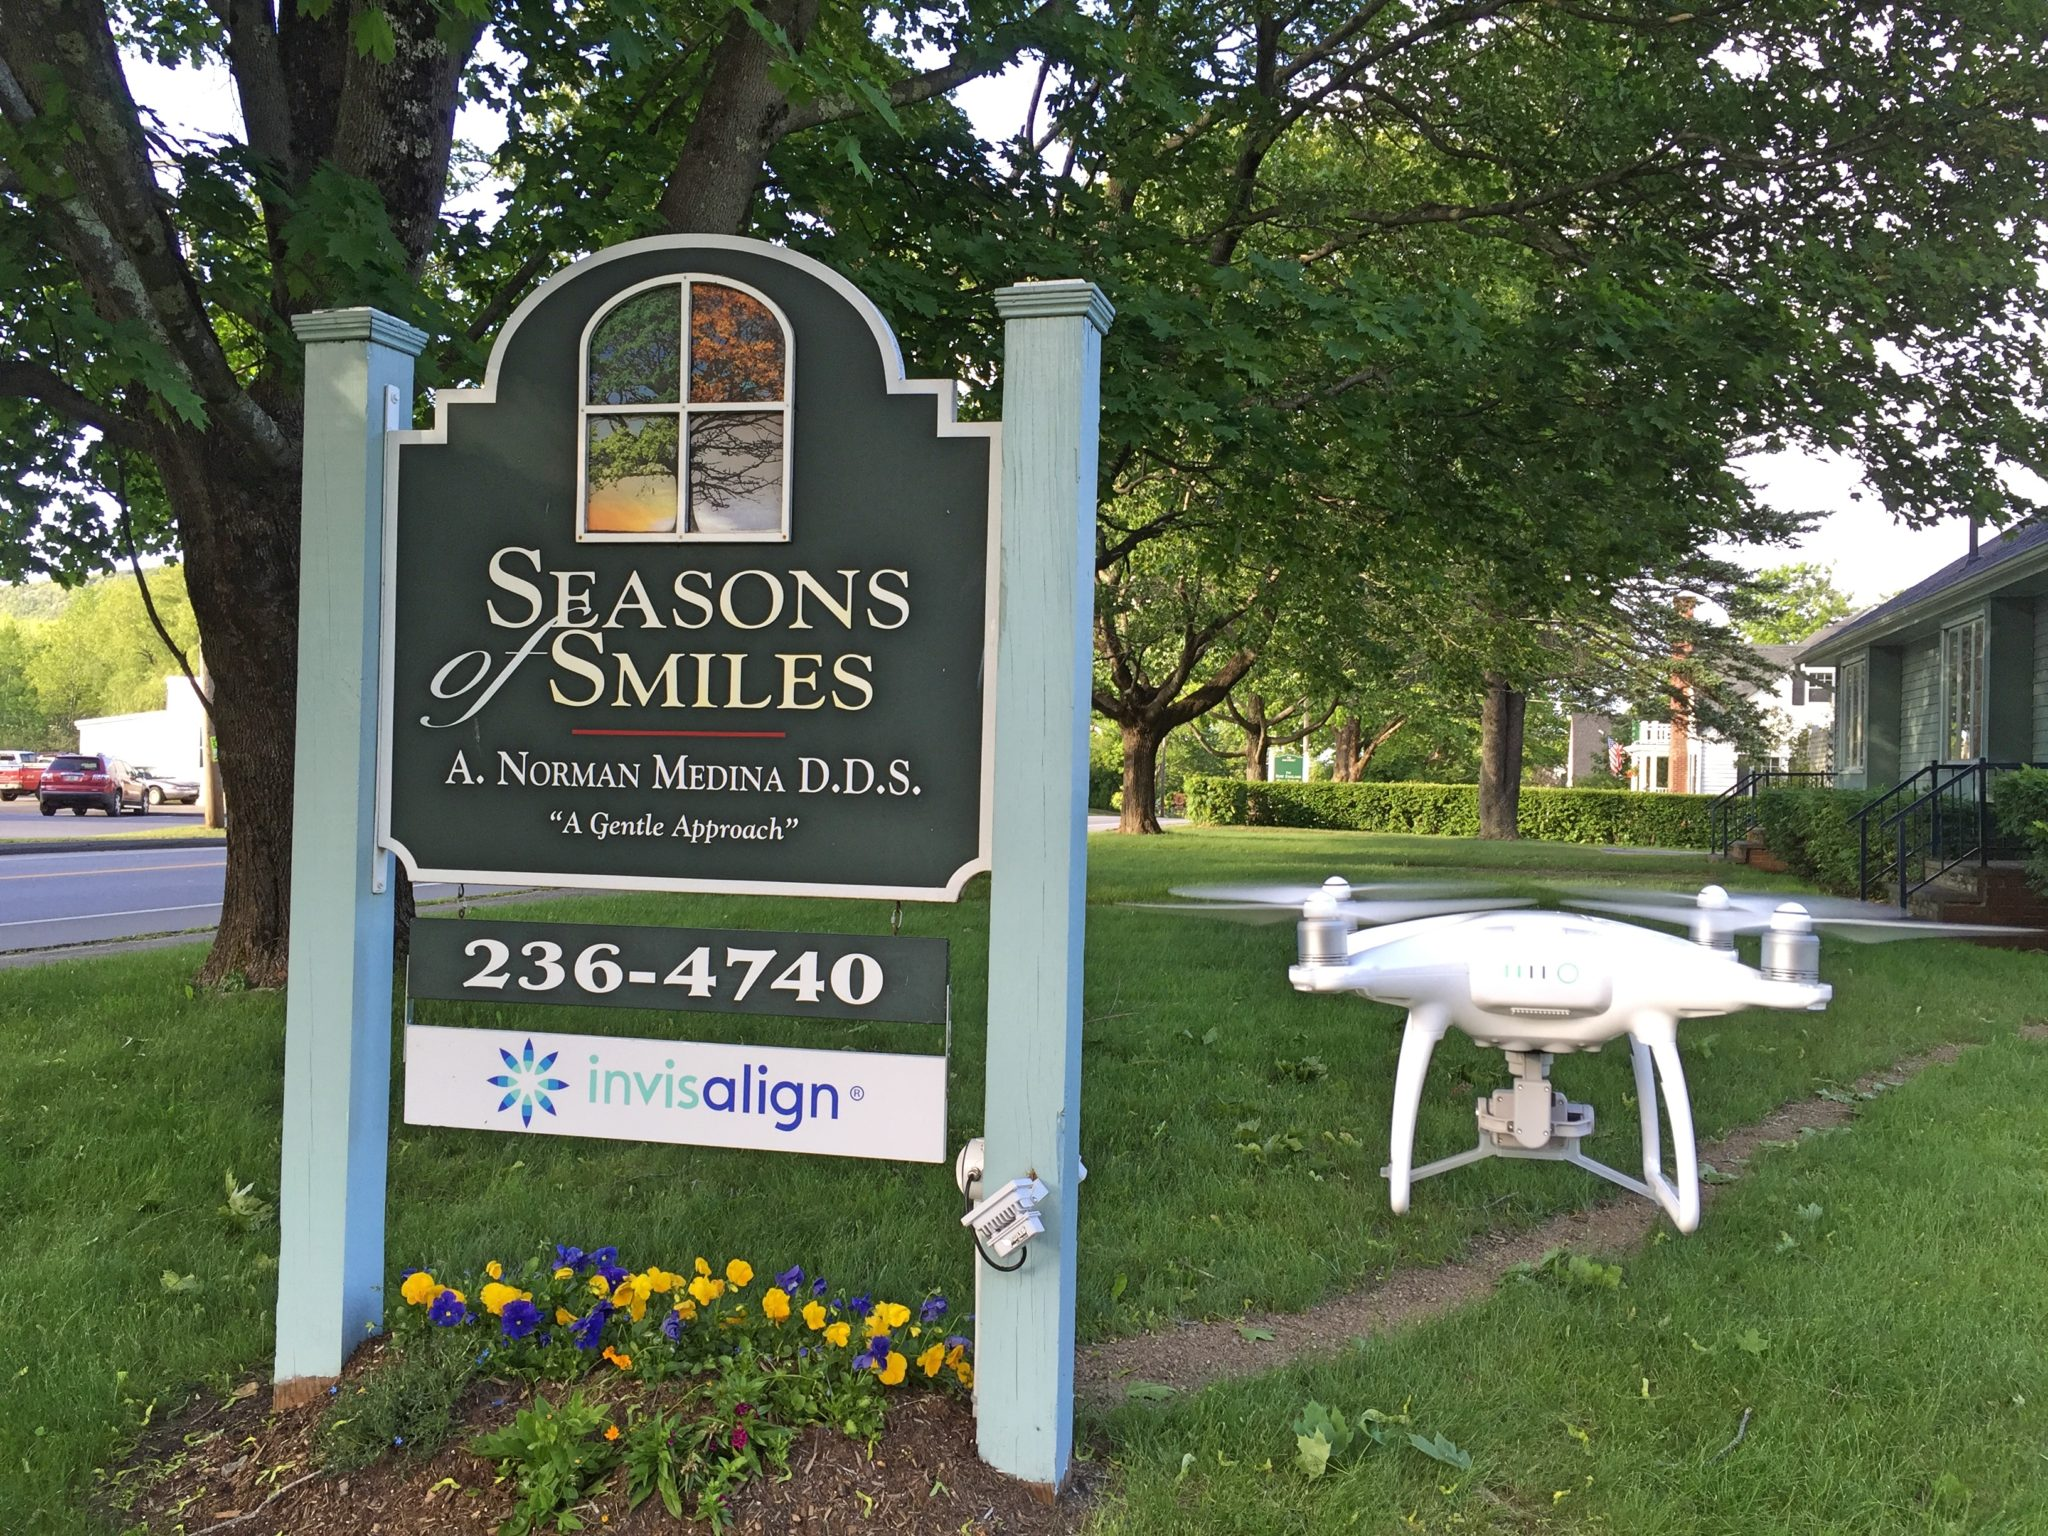 A DJI Phantom 4 Drone at the Dental Office.